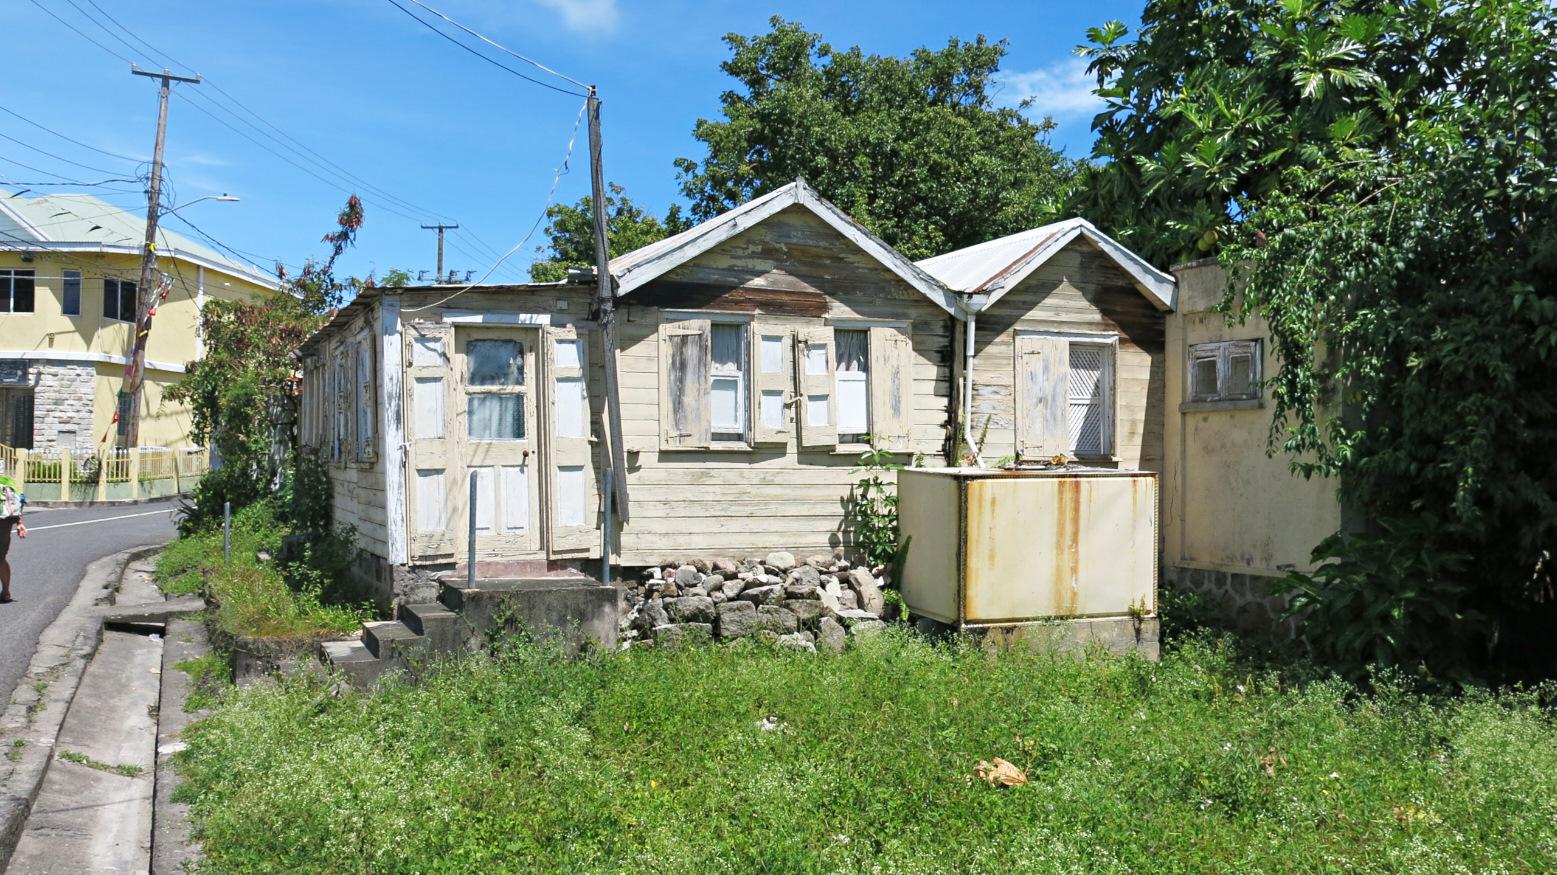 St.Kittes-Nevis-036.jpg